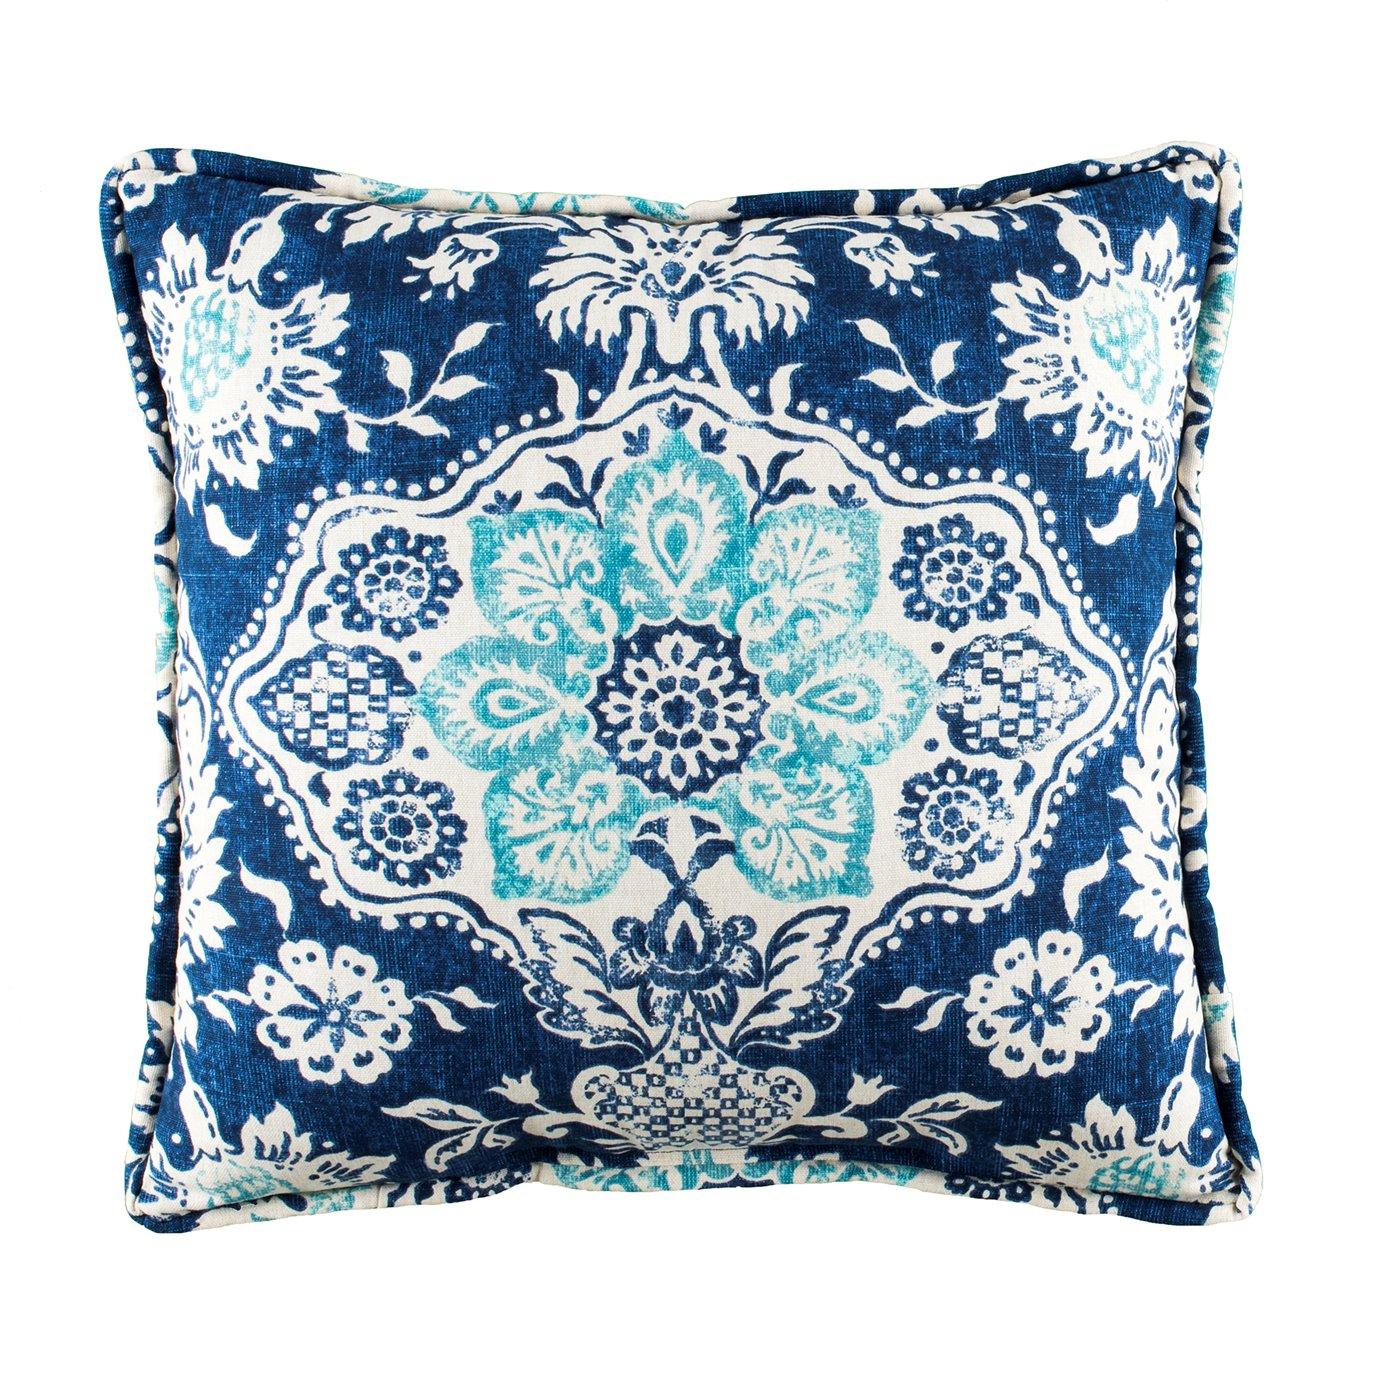 Belmont Harbor Square Pillow